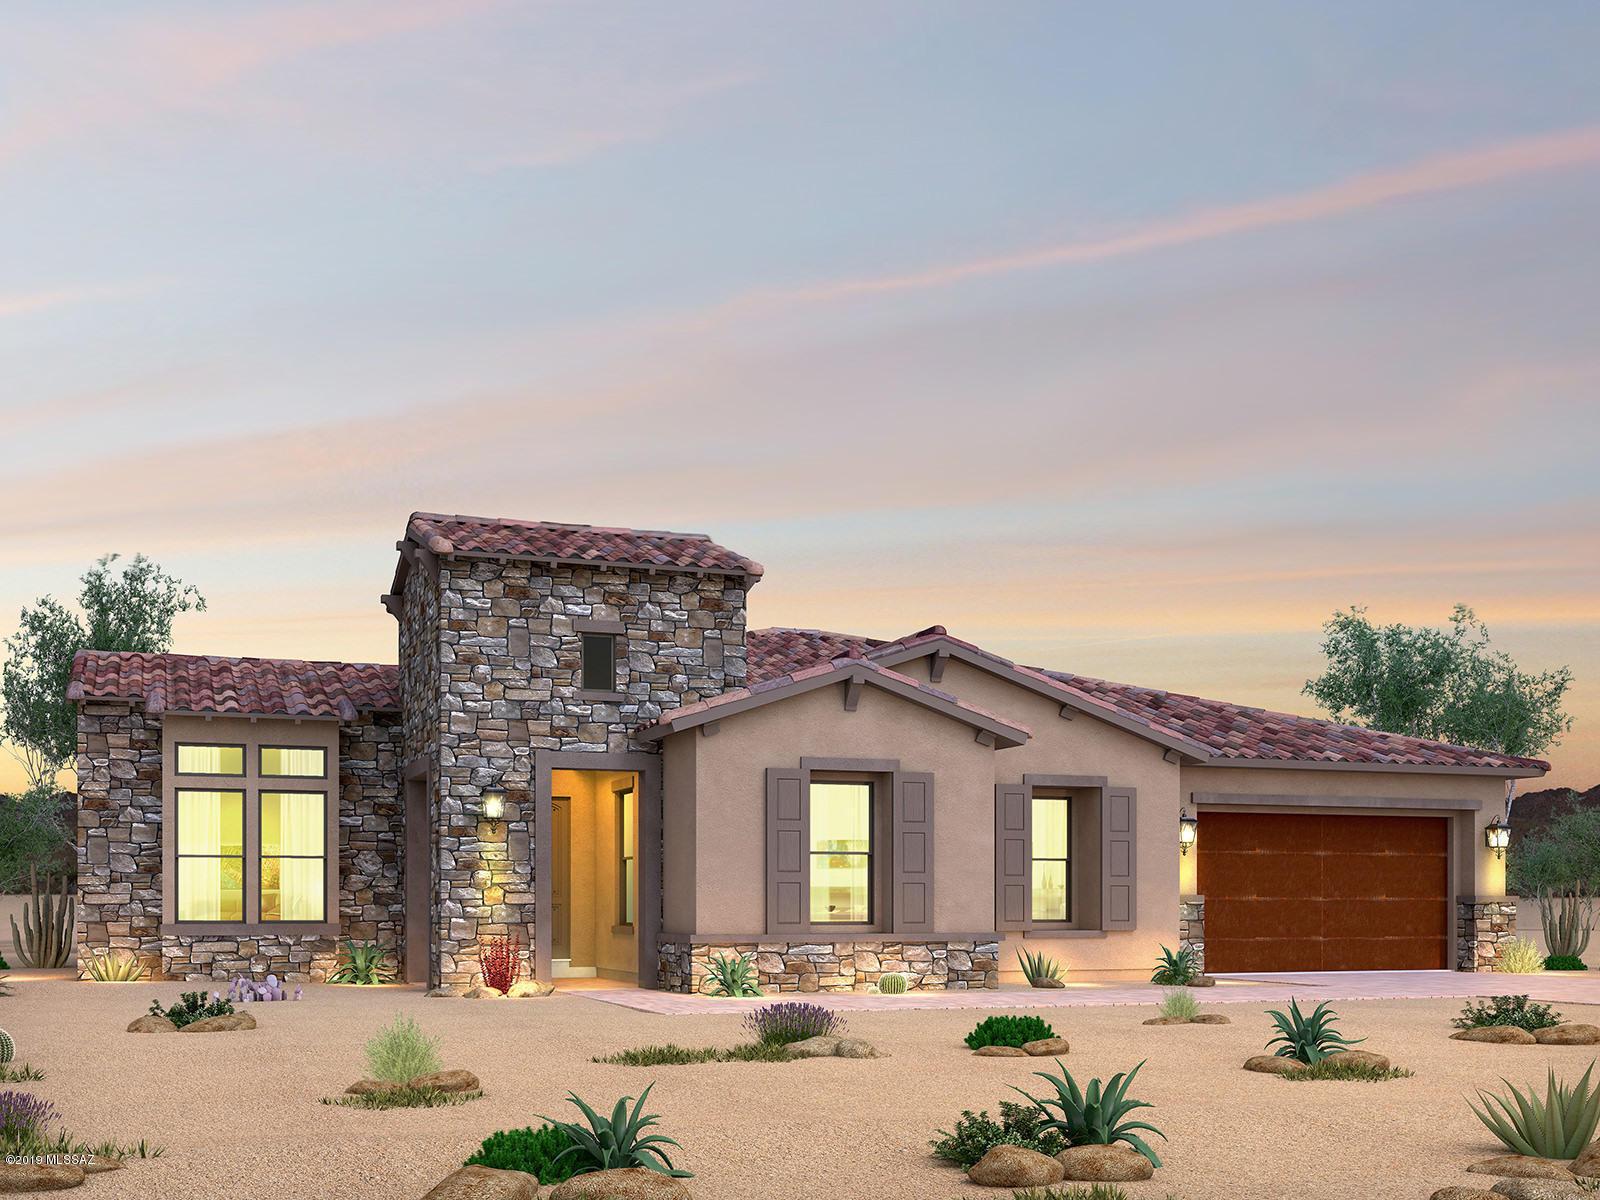 Photo of 13962 N Stone Gate Place, Oro Valley, AZ 85755